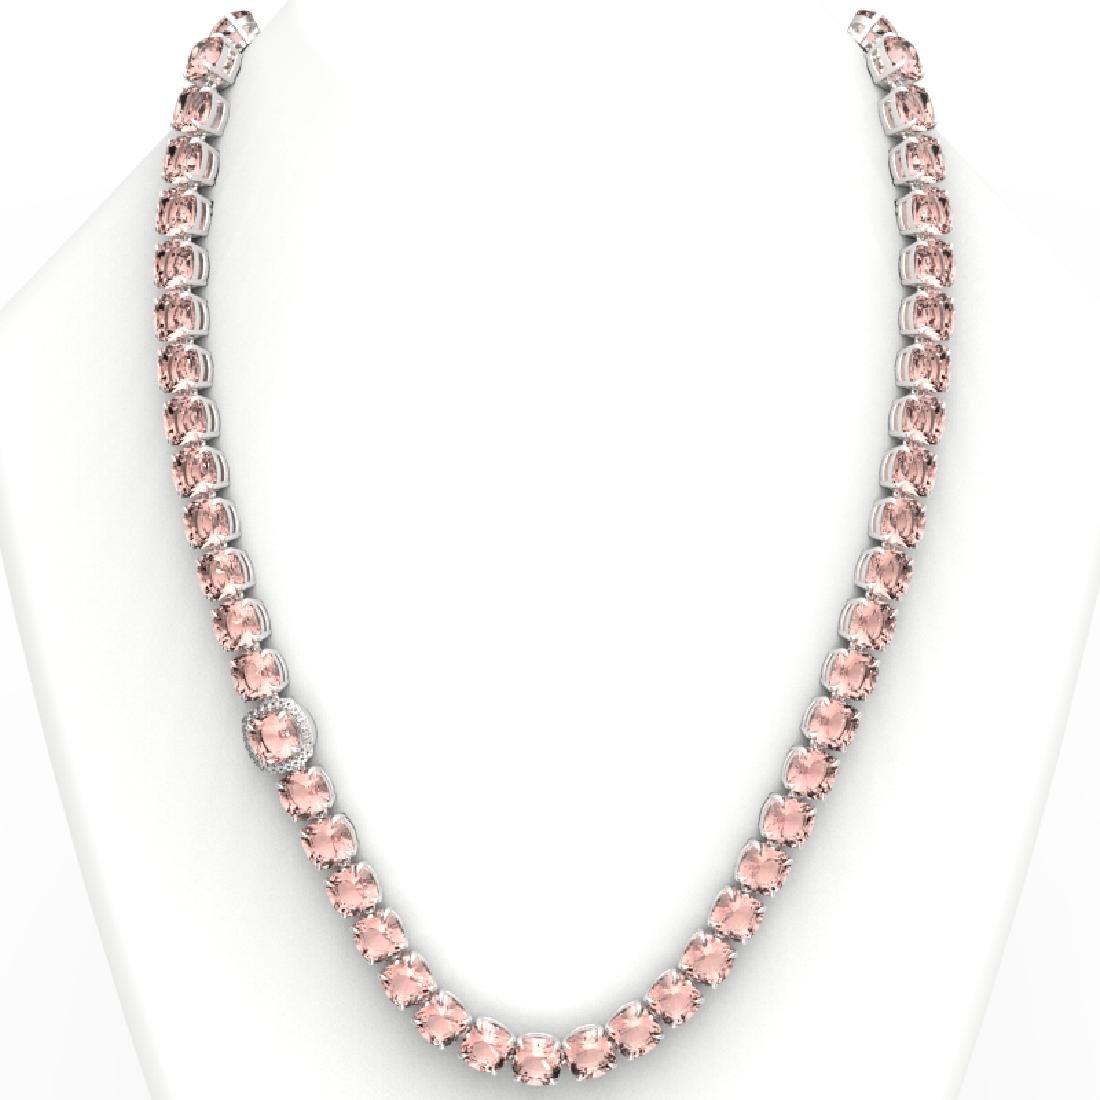 87 CTW Morganite & VS/SI Diamond Necklace 14K White - 3